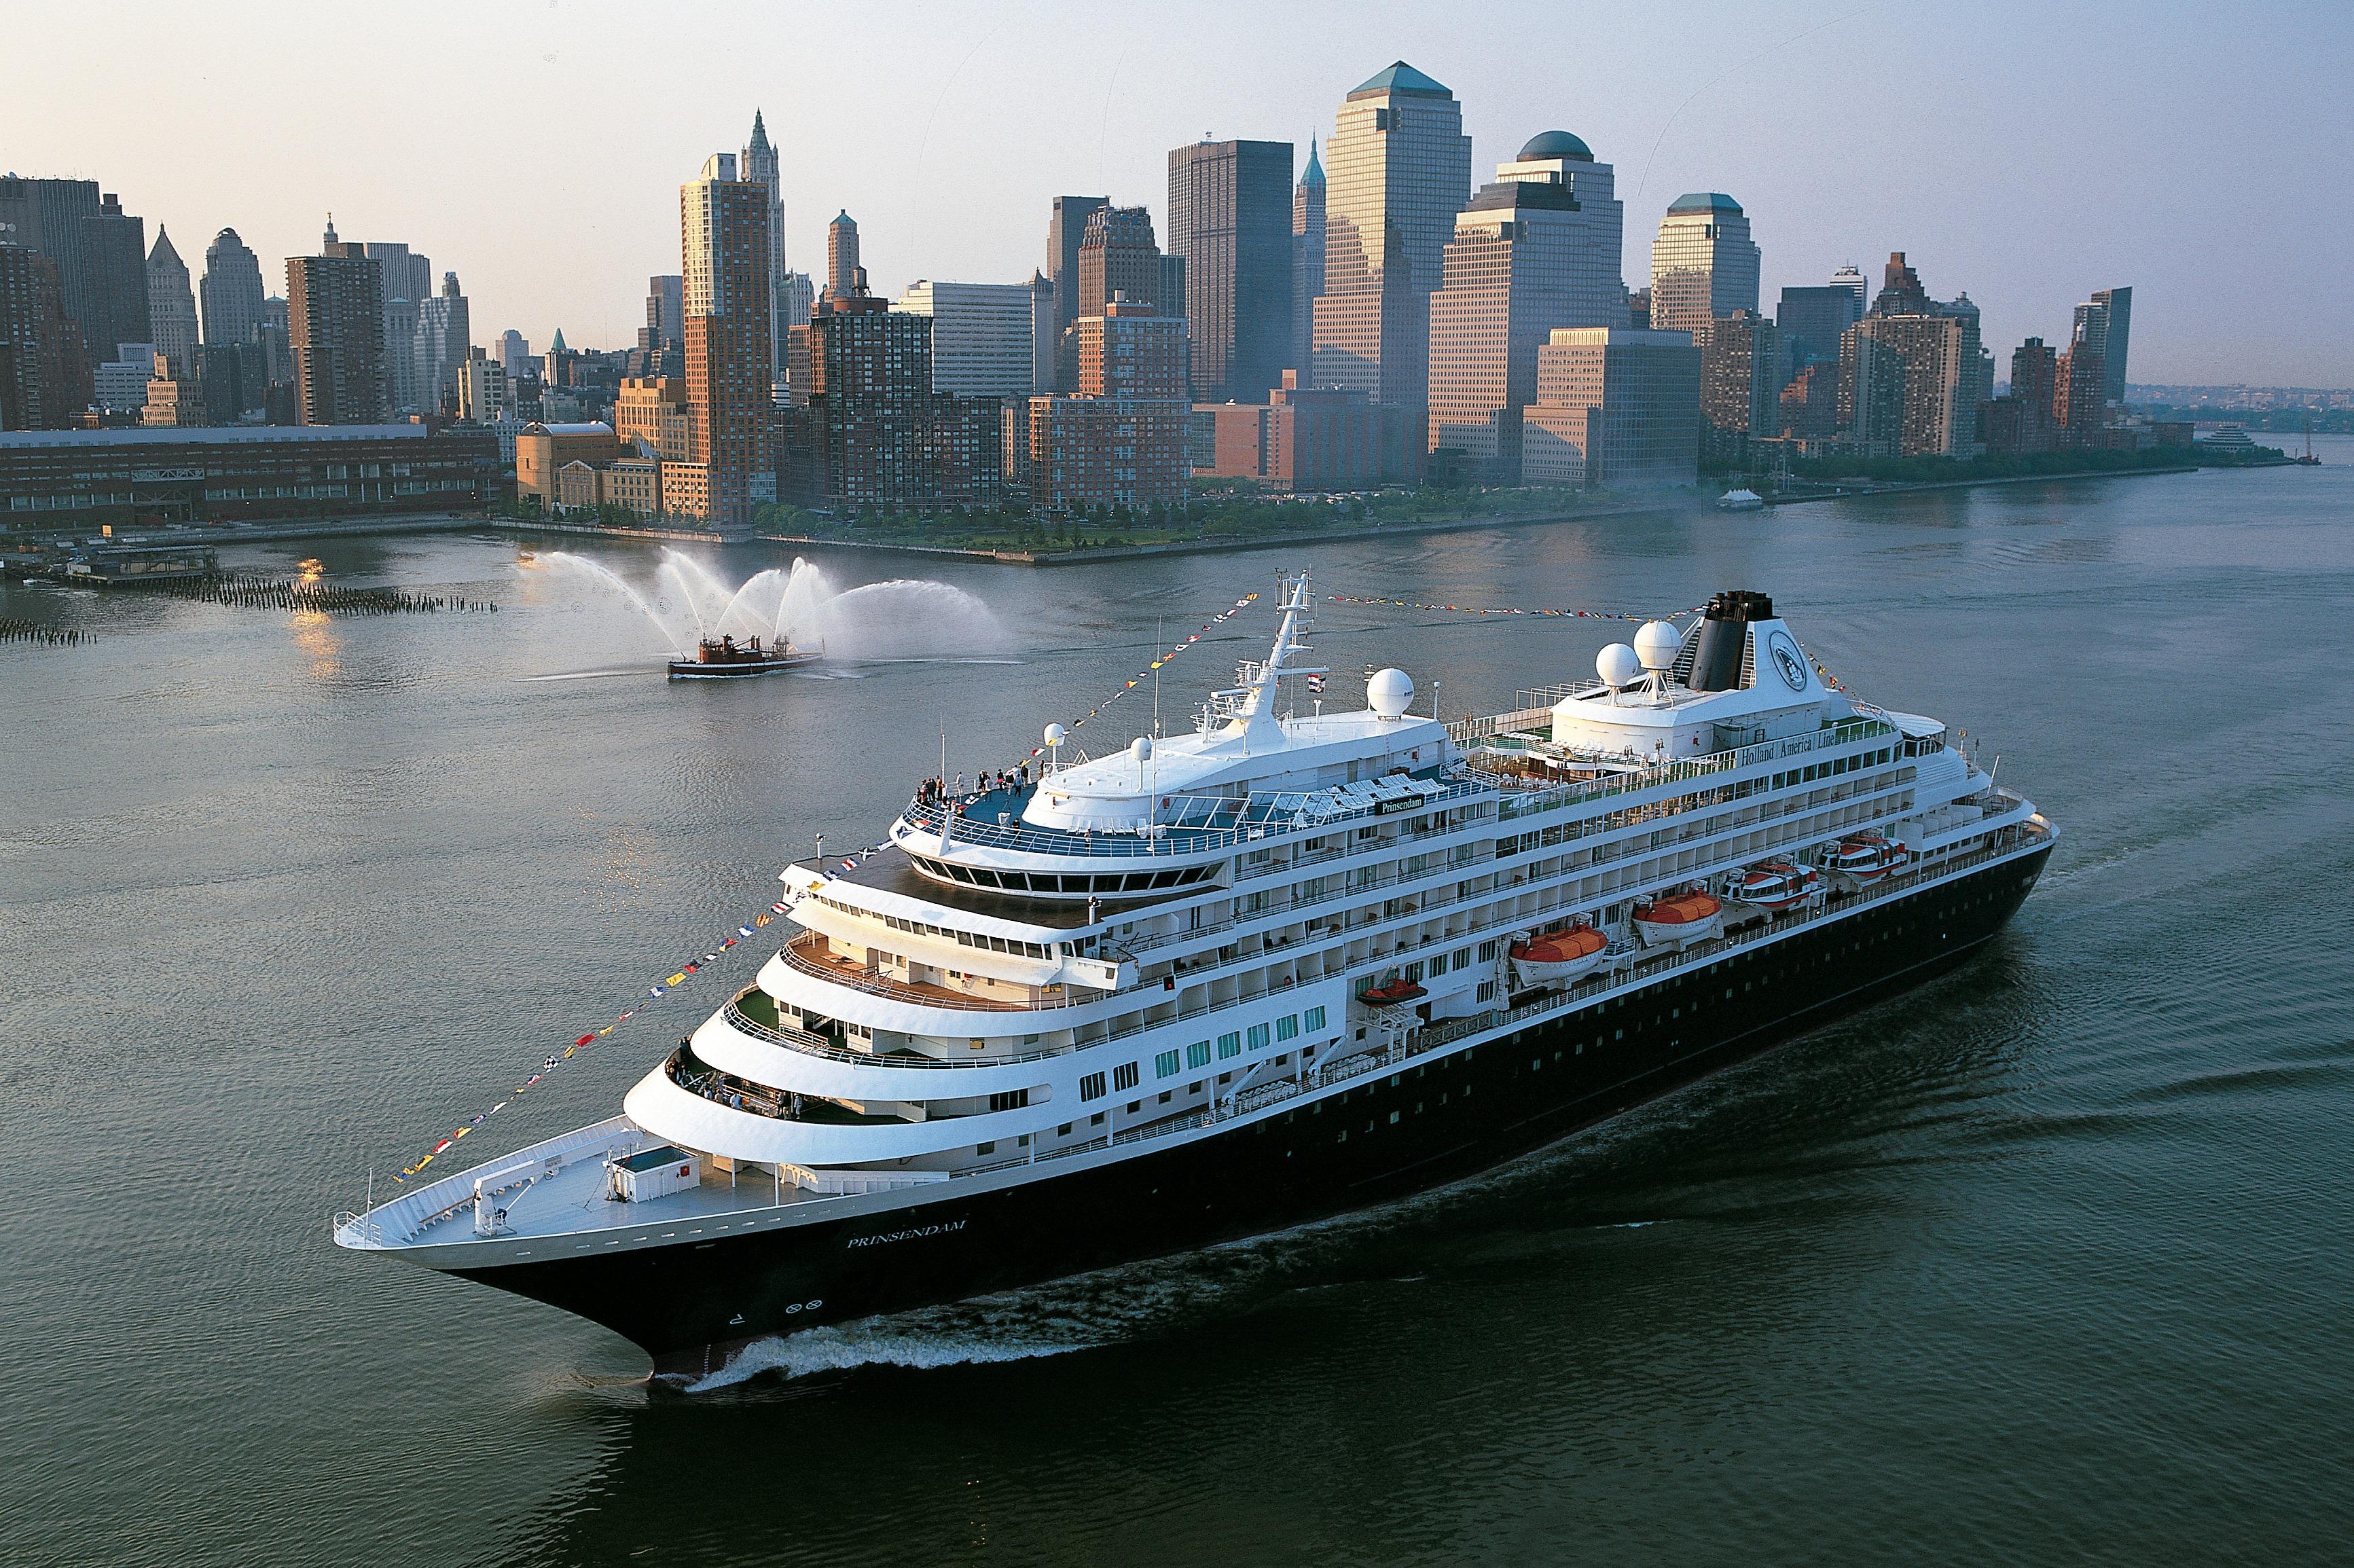 Holland America Line cruises - MS Prinsendam in New York